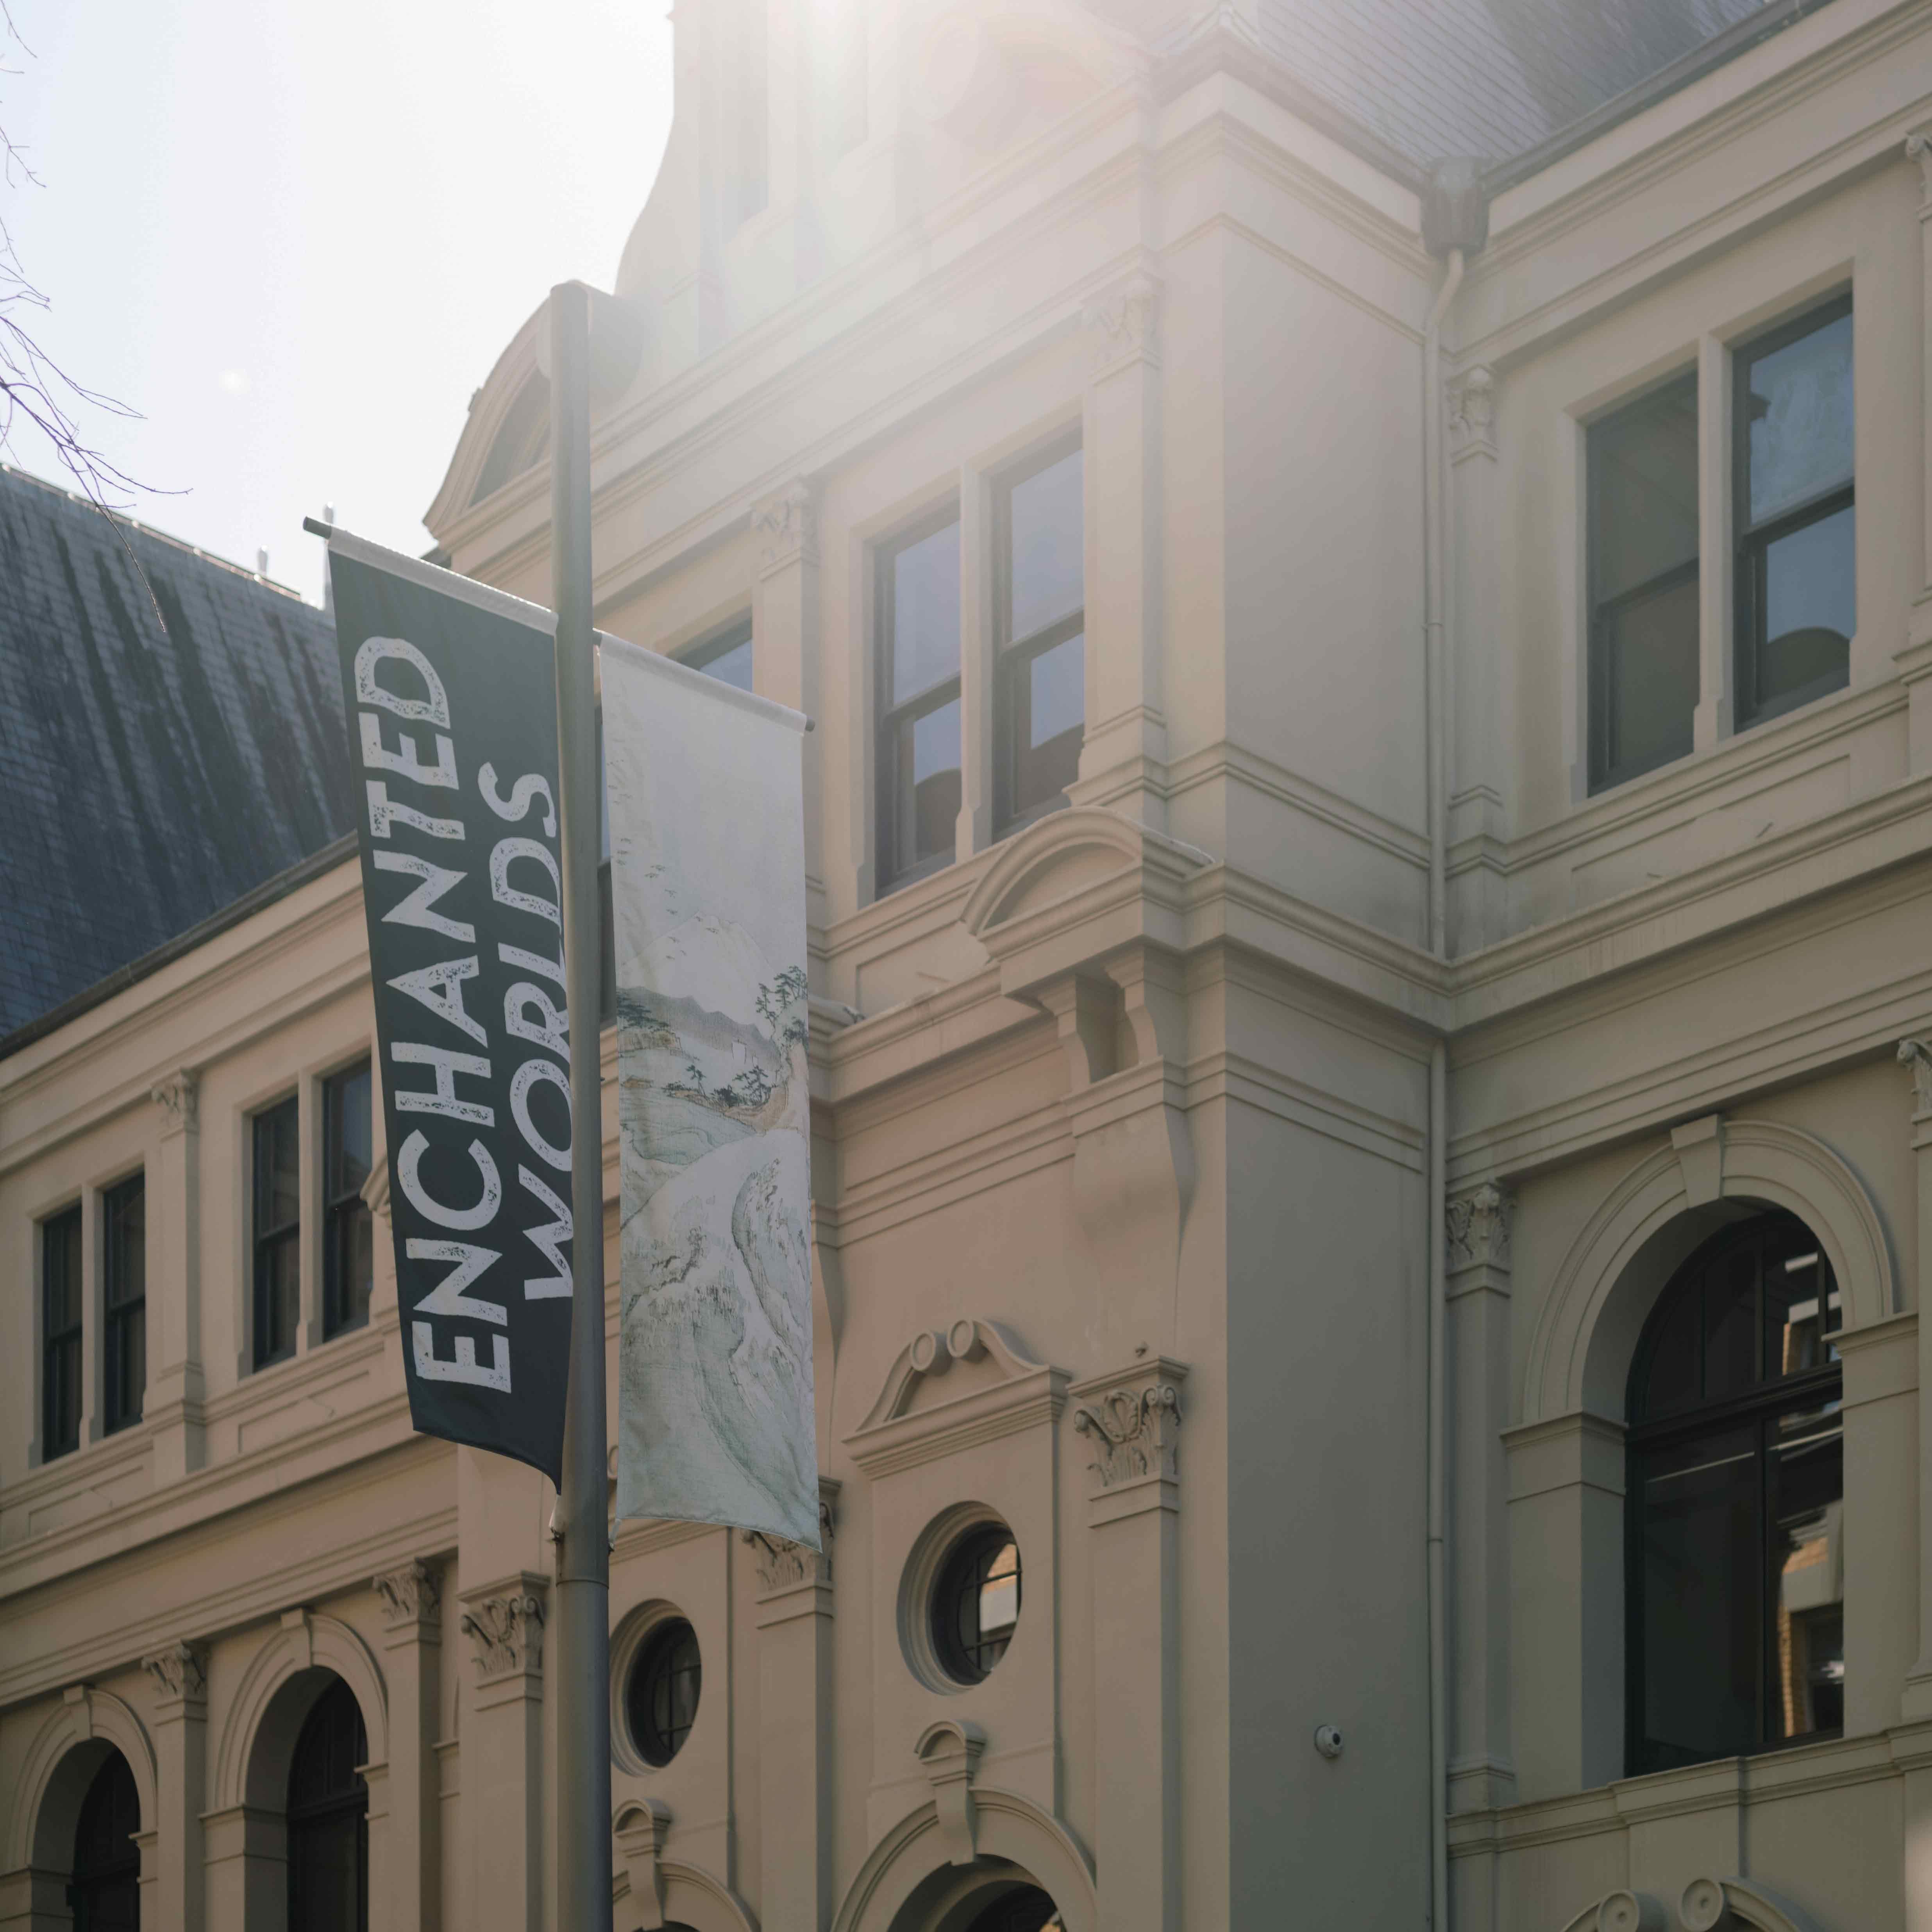 Auckland Art Gallery Toi o Tāmaki reopens 13 June: Nau mai, haere mai! Image